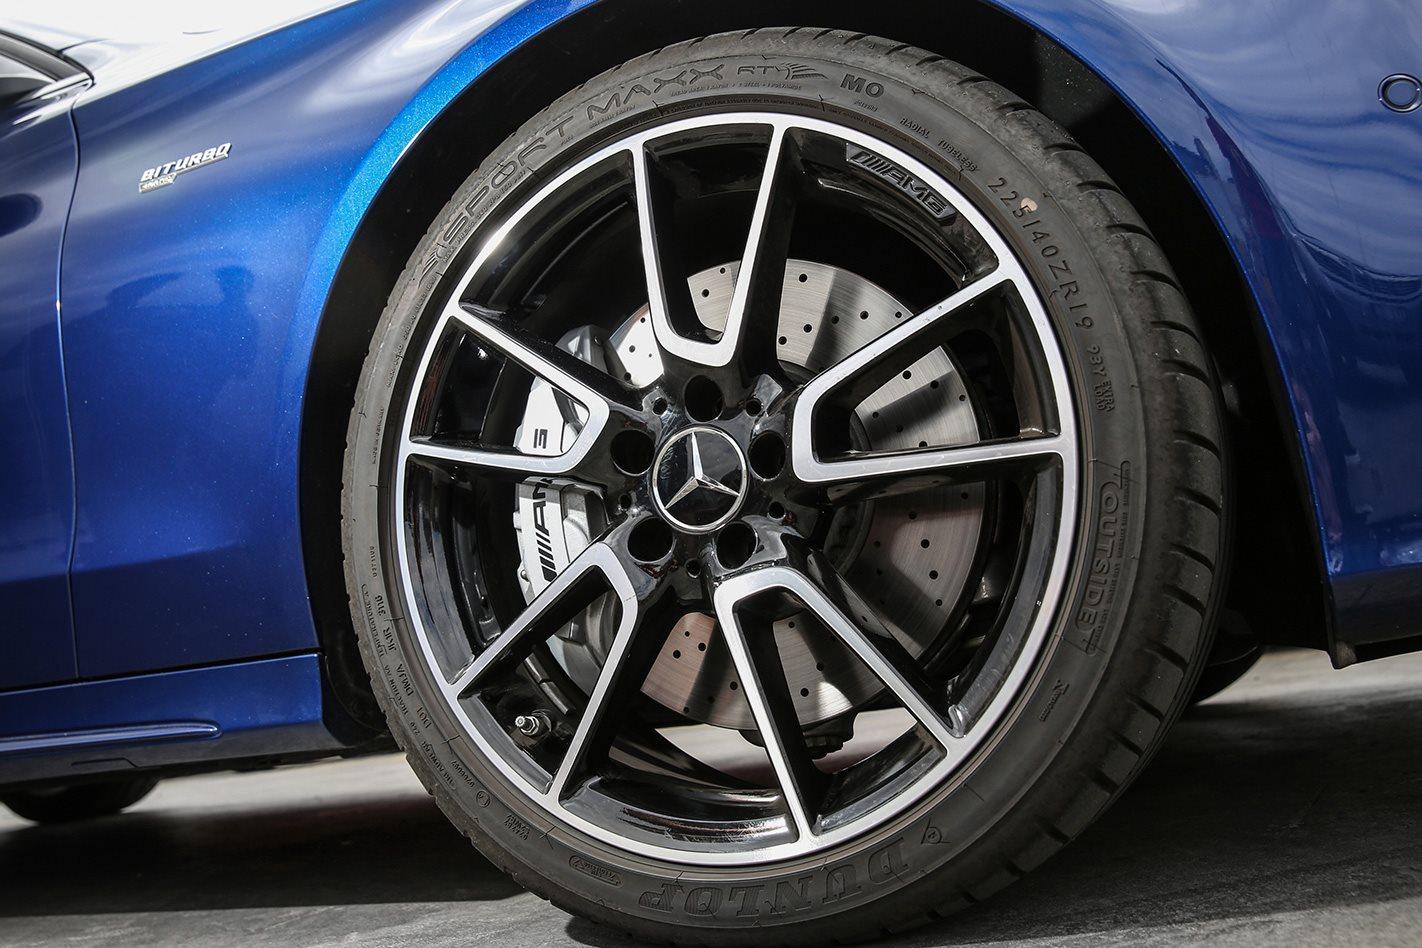 Mercedes AMG C43 wheel